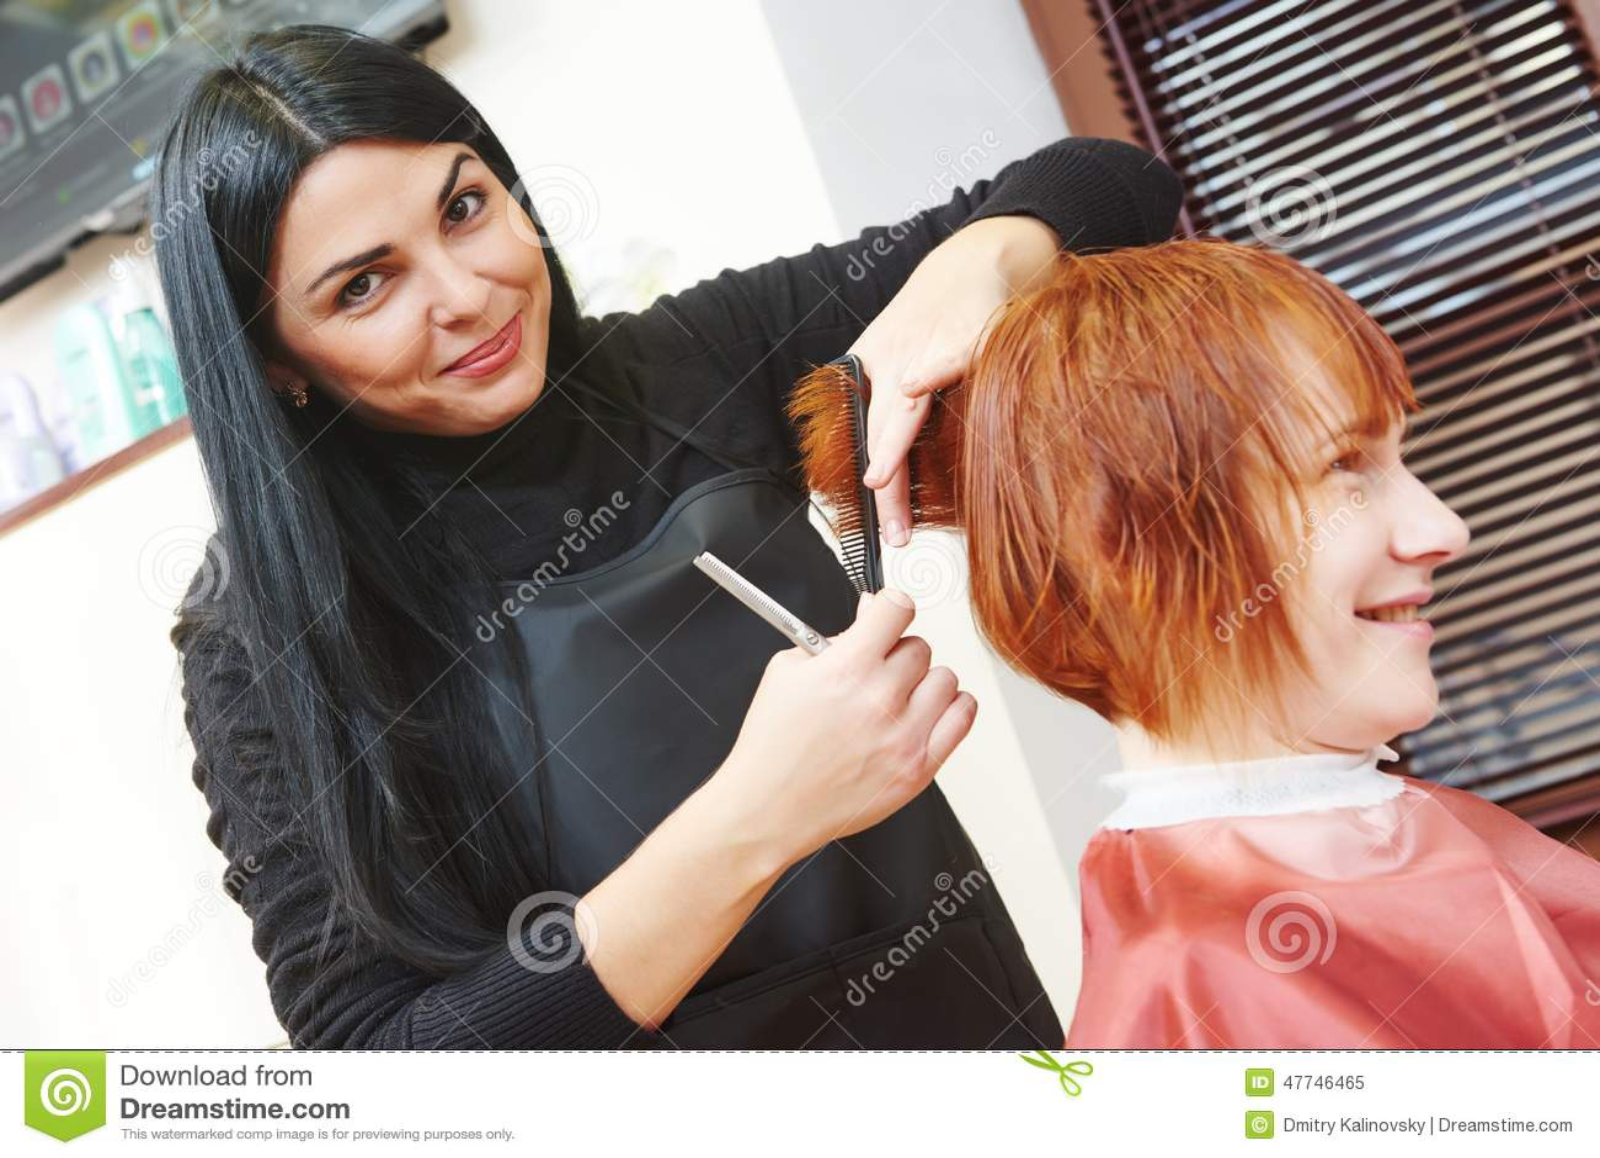 Woman hair cutting work stock image image of girl long - Stylistics hair salon ...